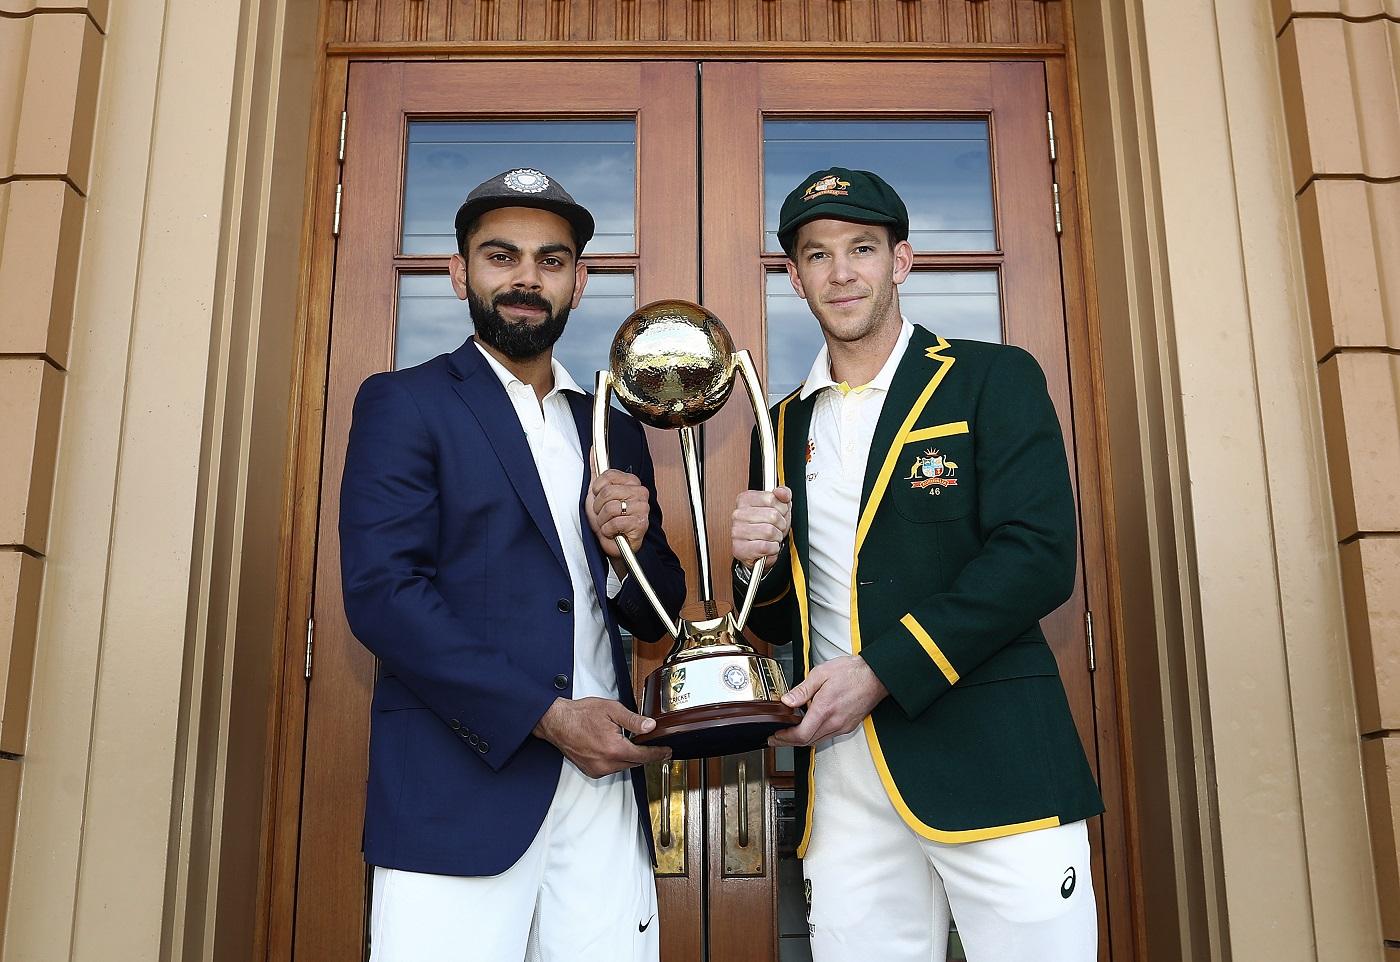 Australia vs India 2018-19: Prithvi Shaw Likely To Return For Third Test, Says Ravi Shastri 2